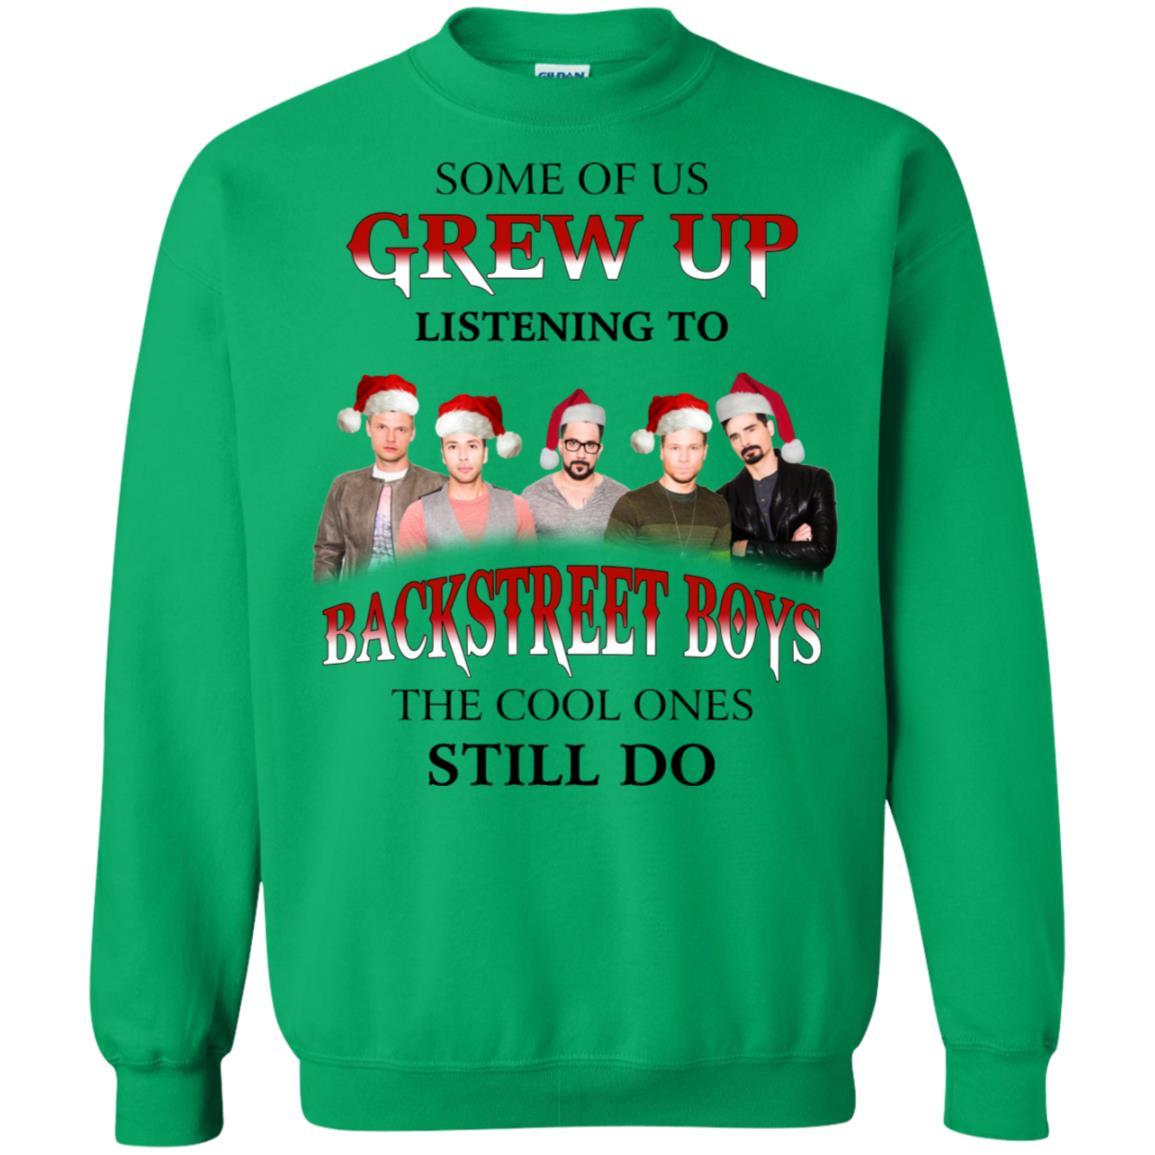 Backstreet Boys Christmas Sweater.Some Of Us Grew Up Listening To Backstreet Boys T Shirt Ls Sweatshirt